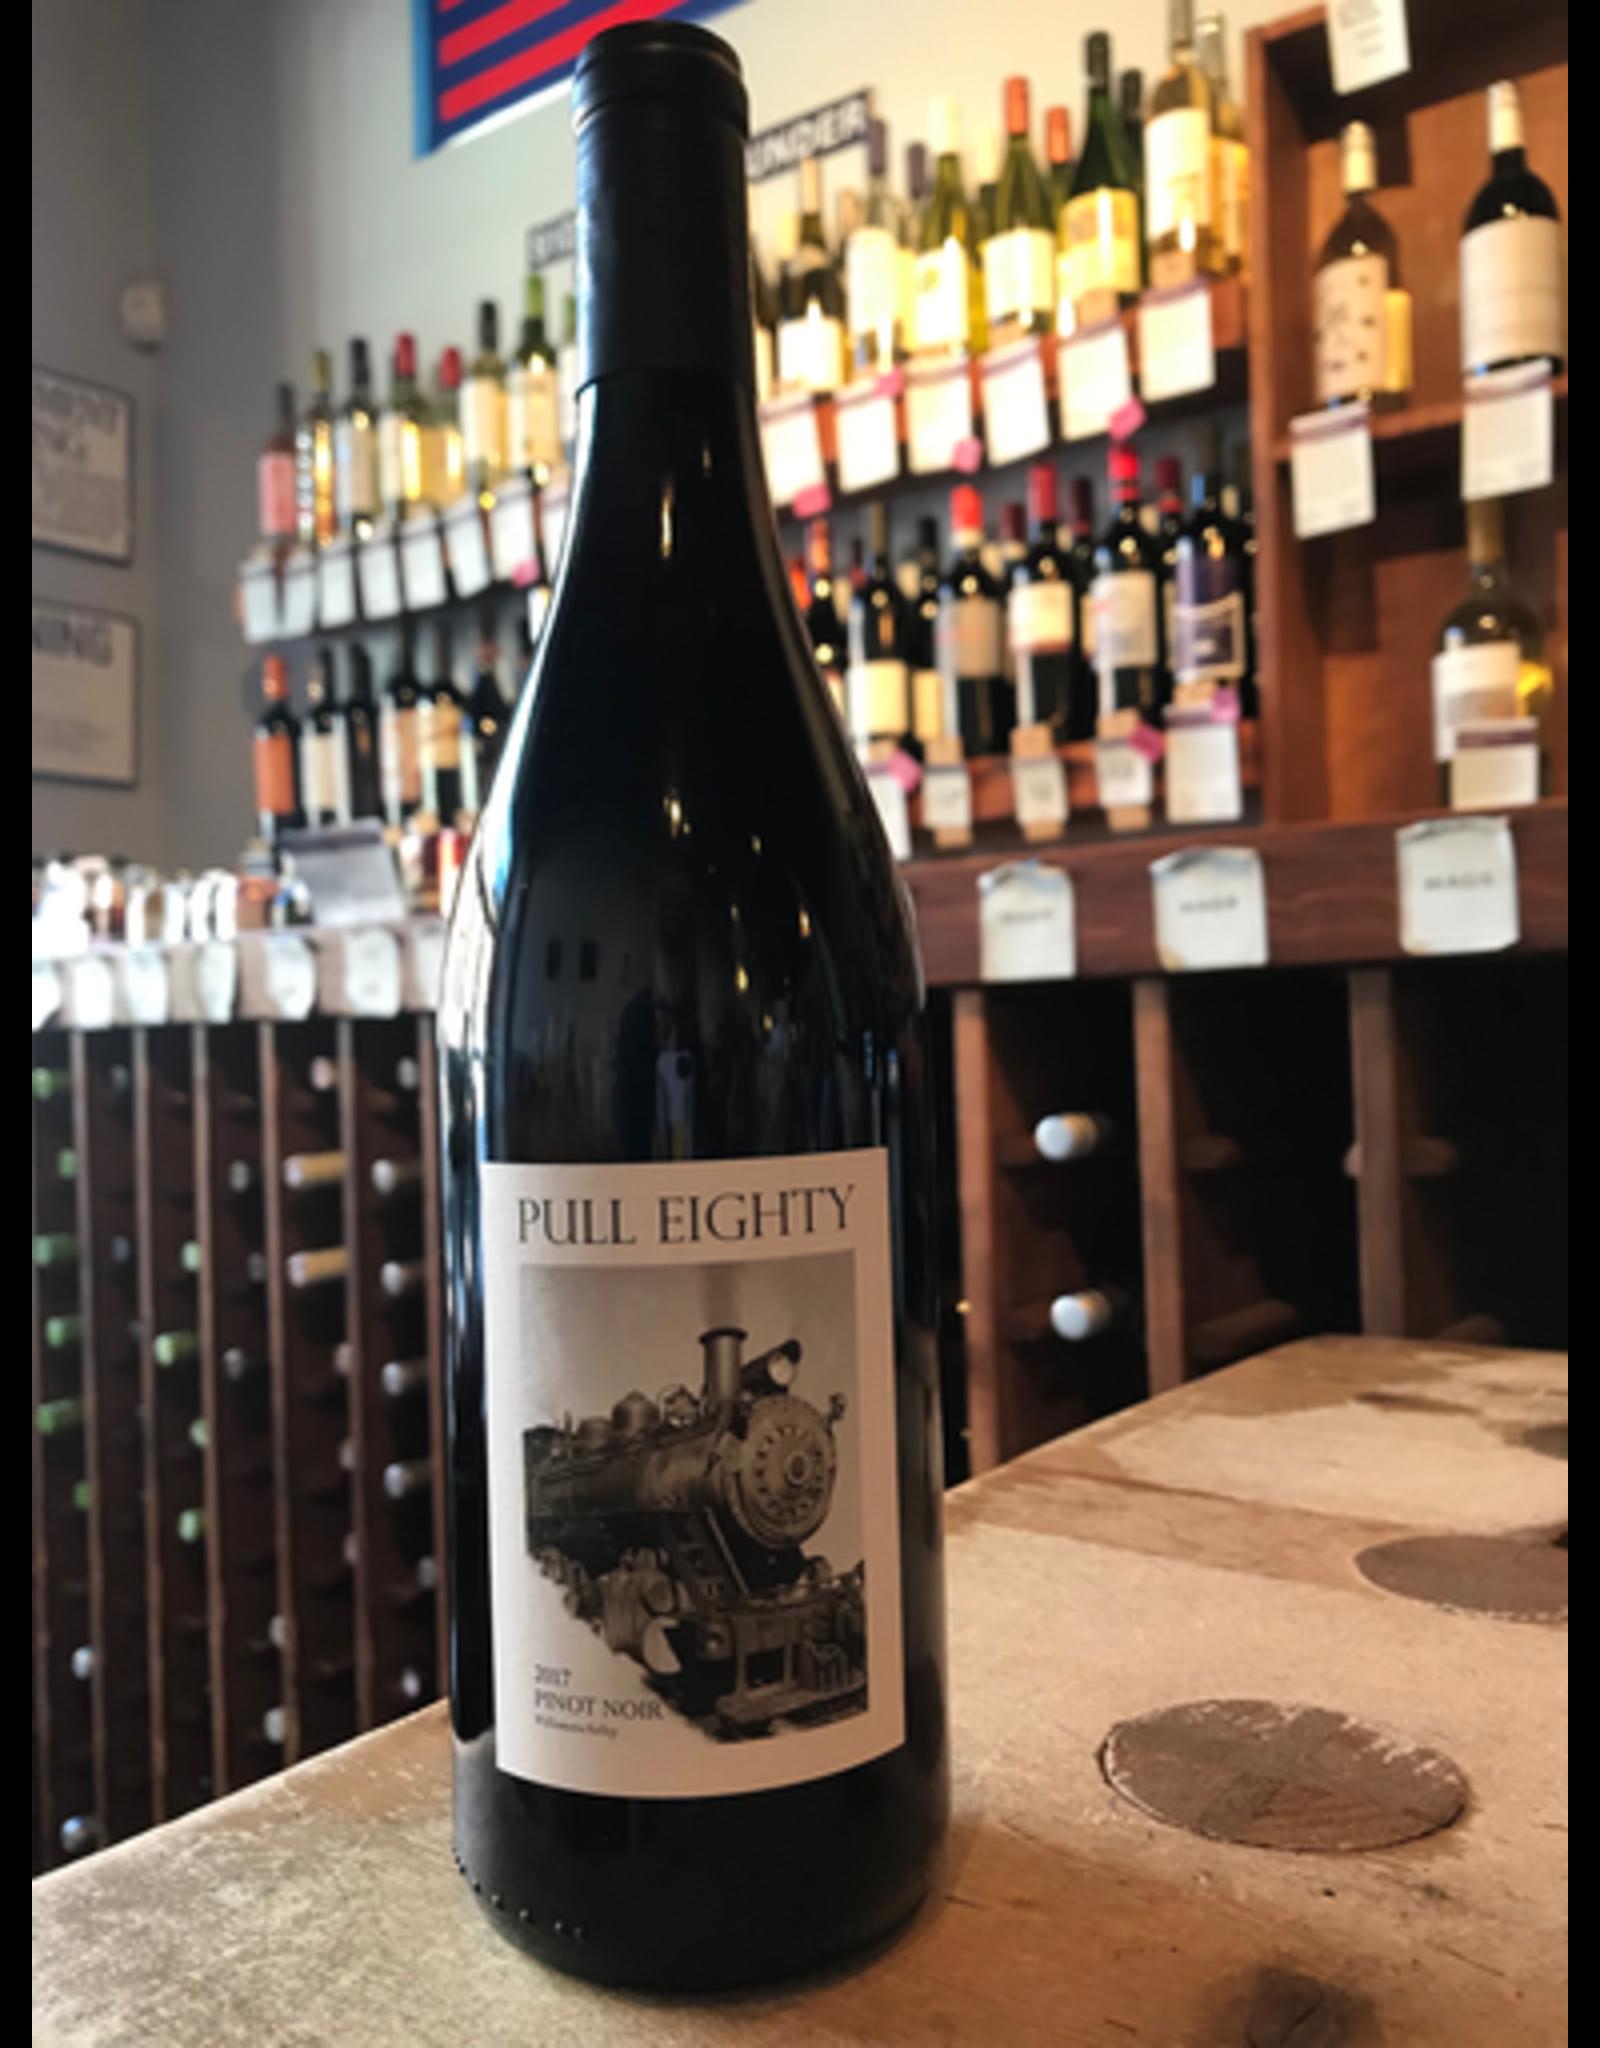 2017 Pull Eighty Pinot Noir - Willamette Valley, Oregon